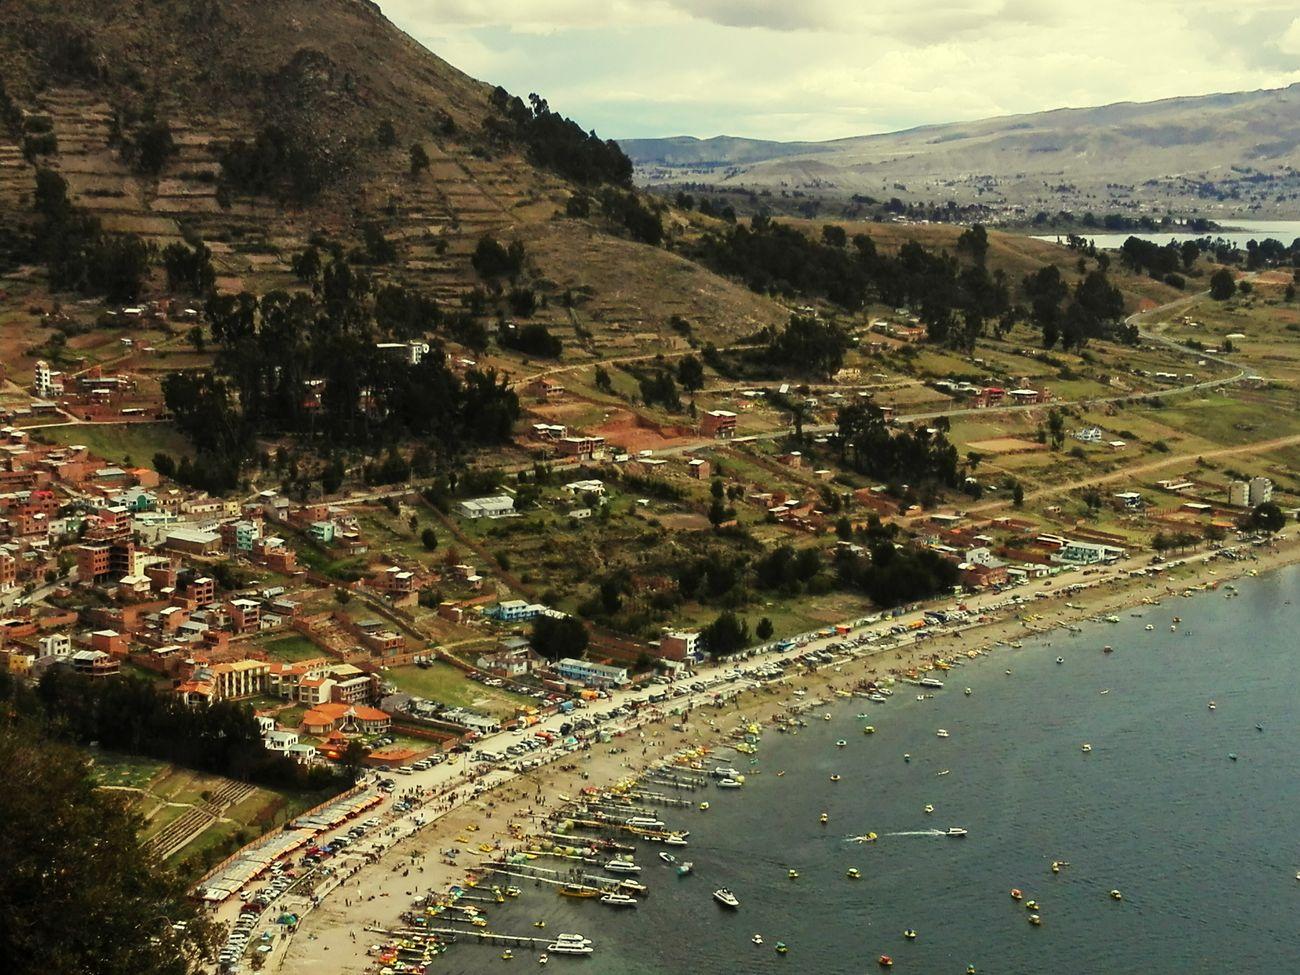 como tus ojos se reflejan en el mar Melancolia Lago Titicaca Mountain Cityscape